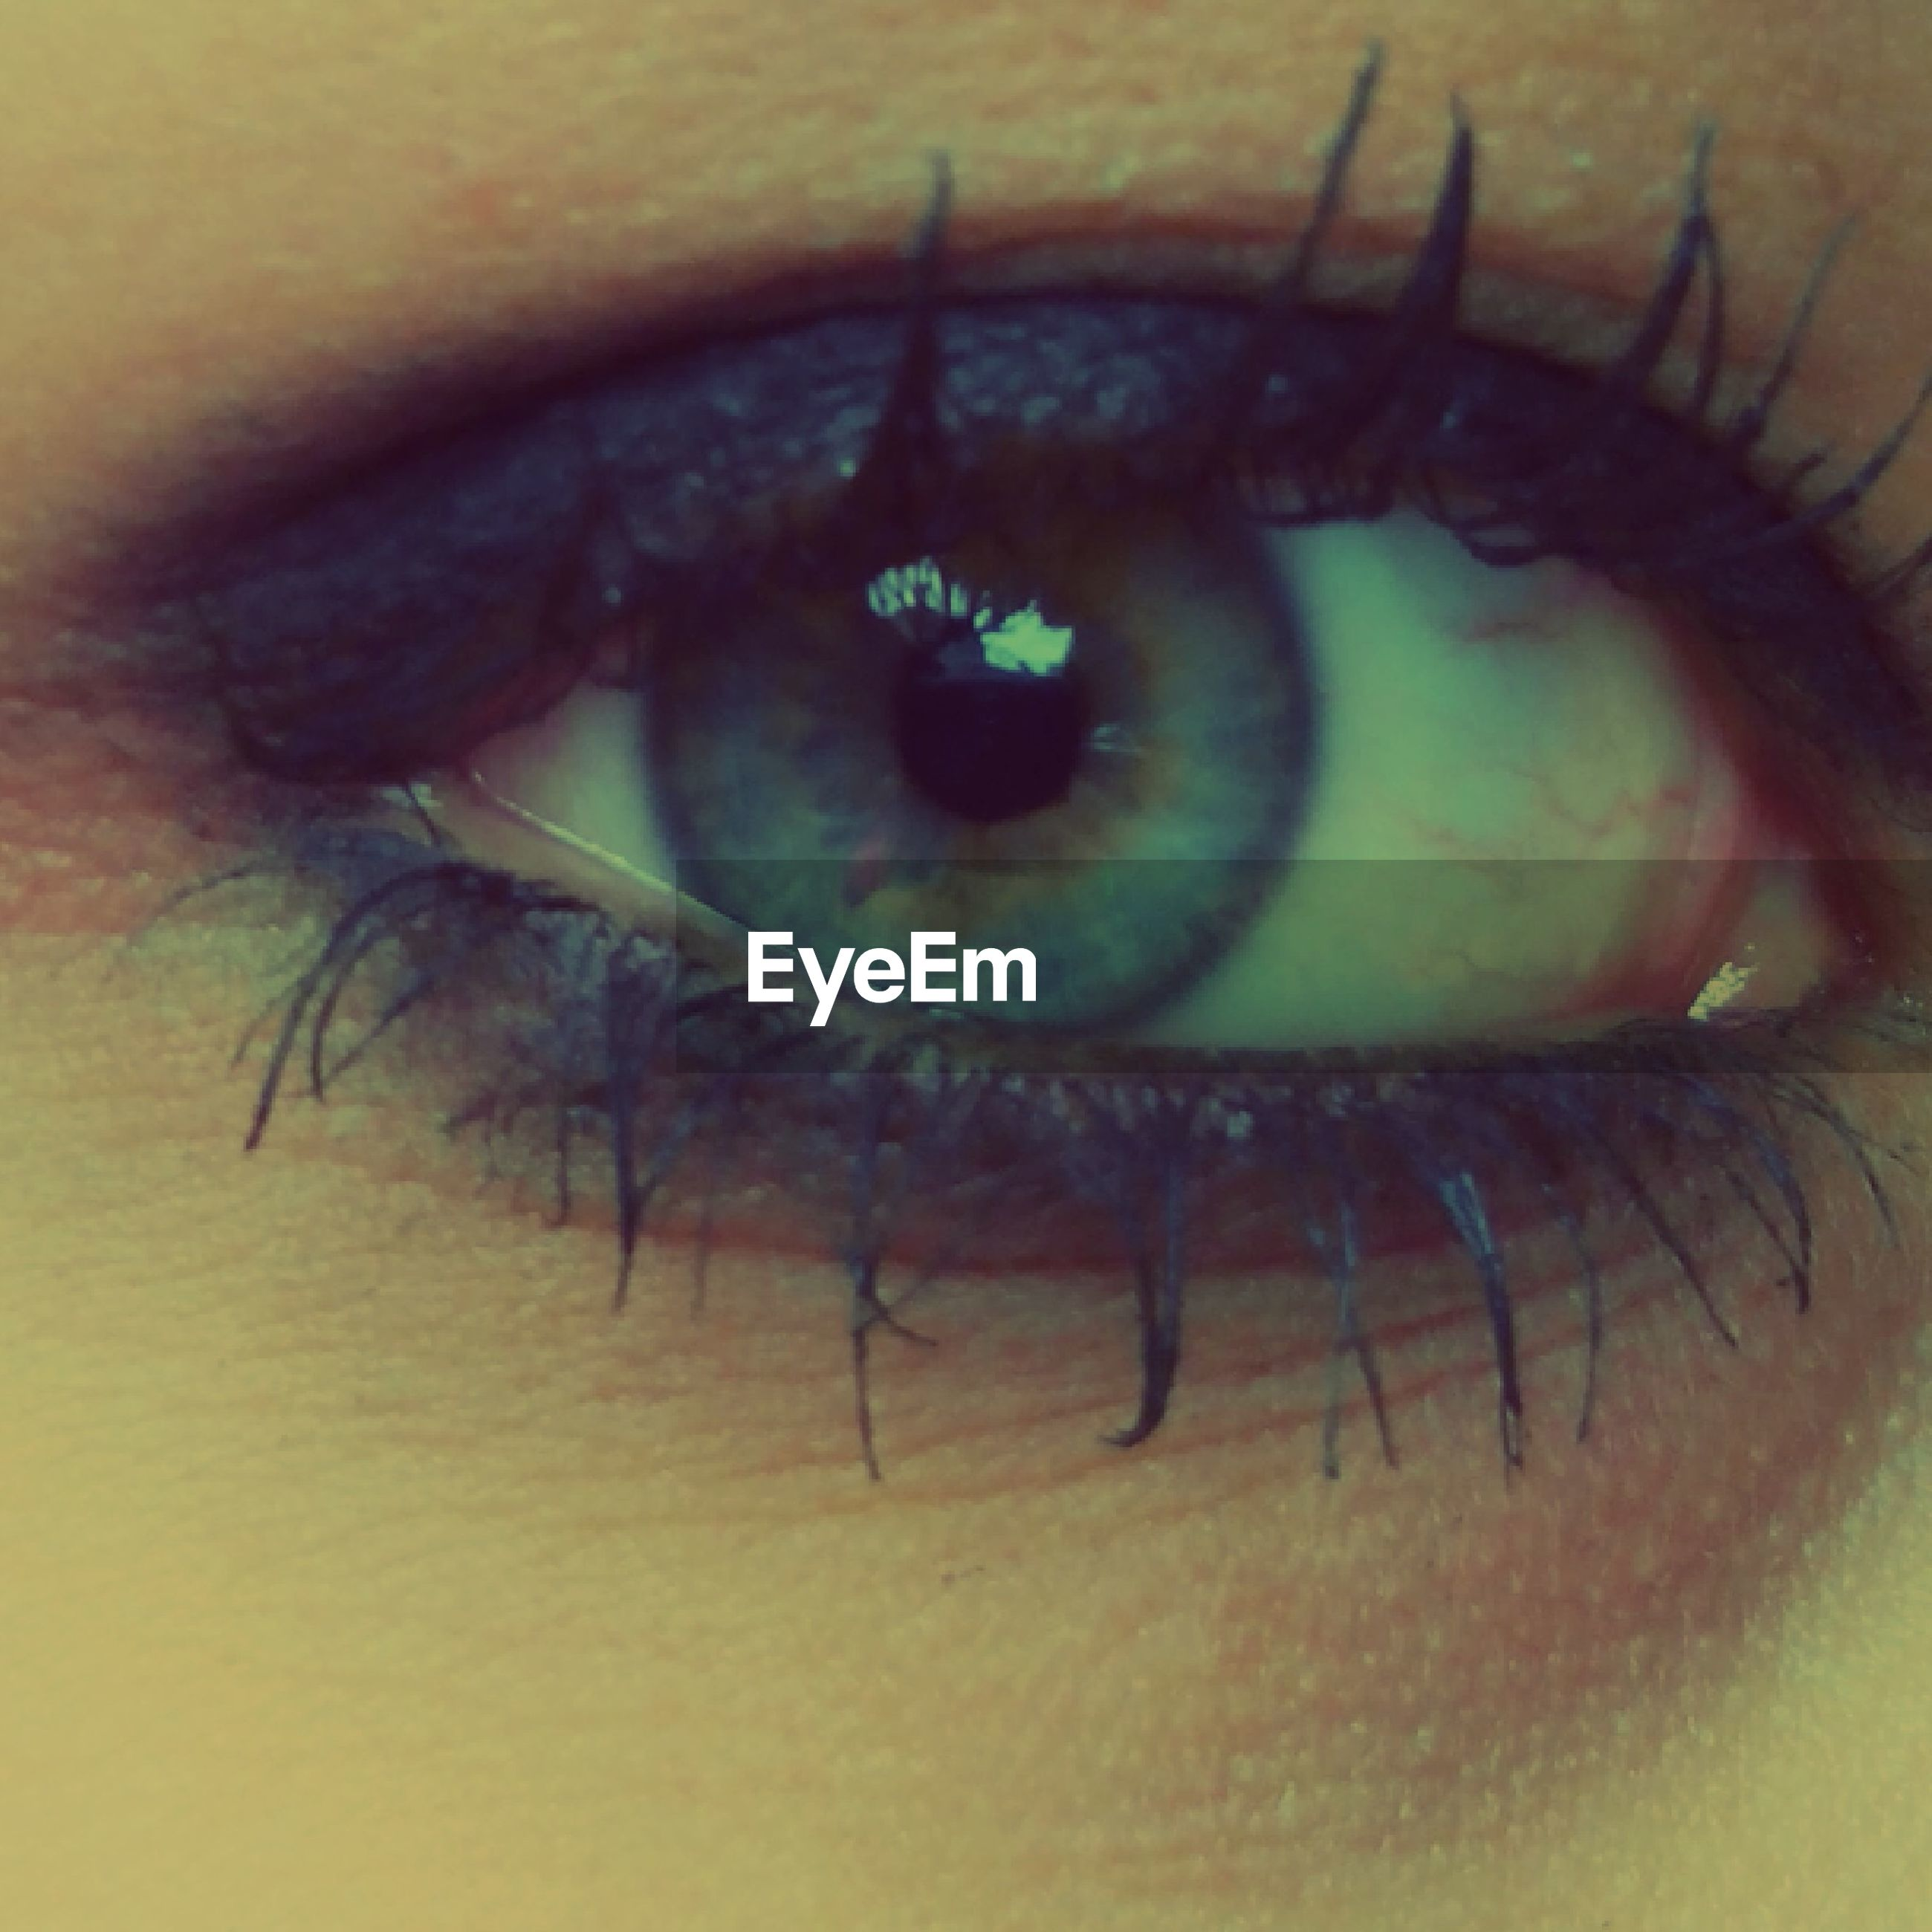 human eye, close-up, eyelash, eyesight, part of, looking at camera, portrait, sensory perception, indoors, unrecognizable person, extreme close-up, lifestyles, eyeball, human skin, person, cropped, one animal